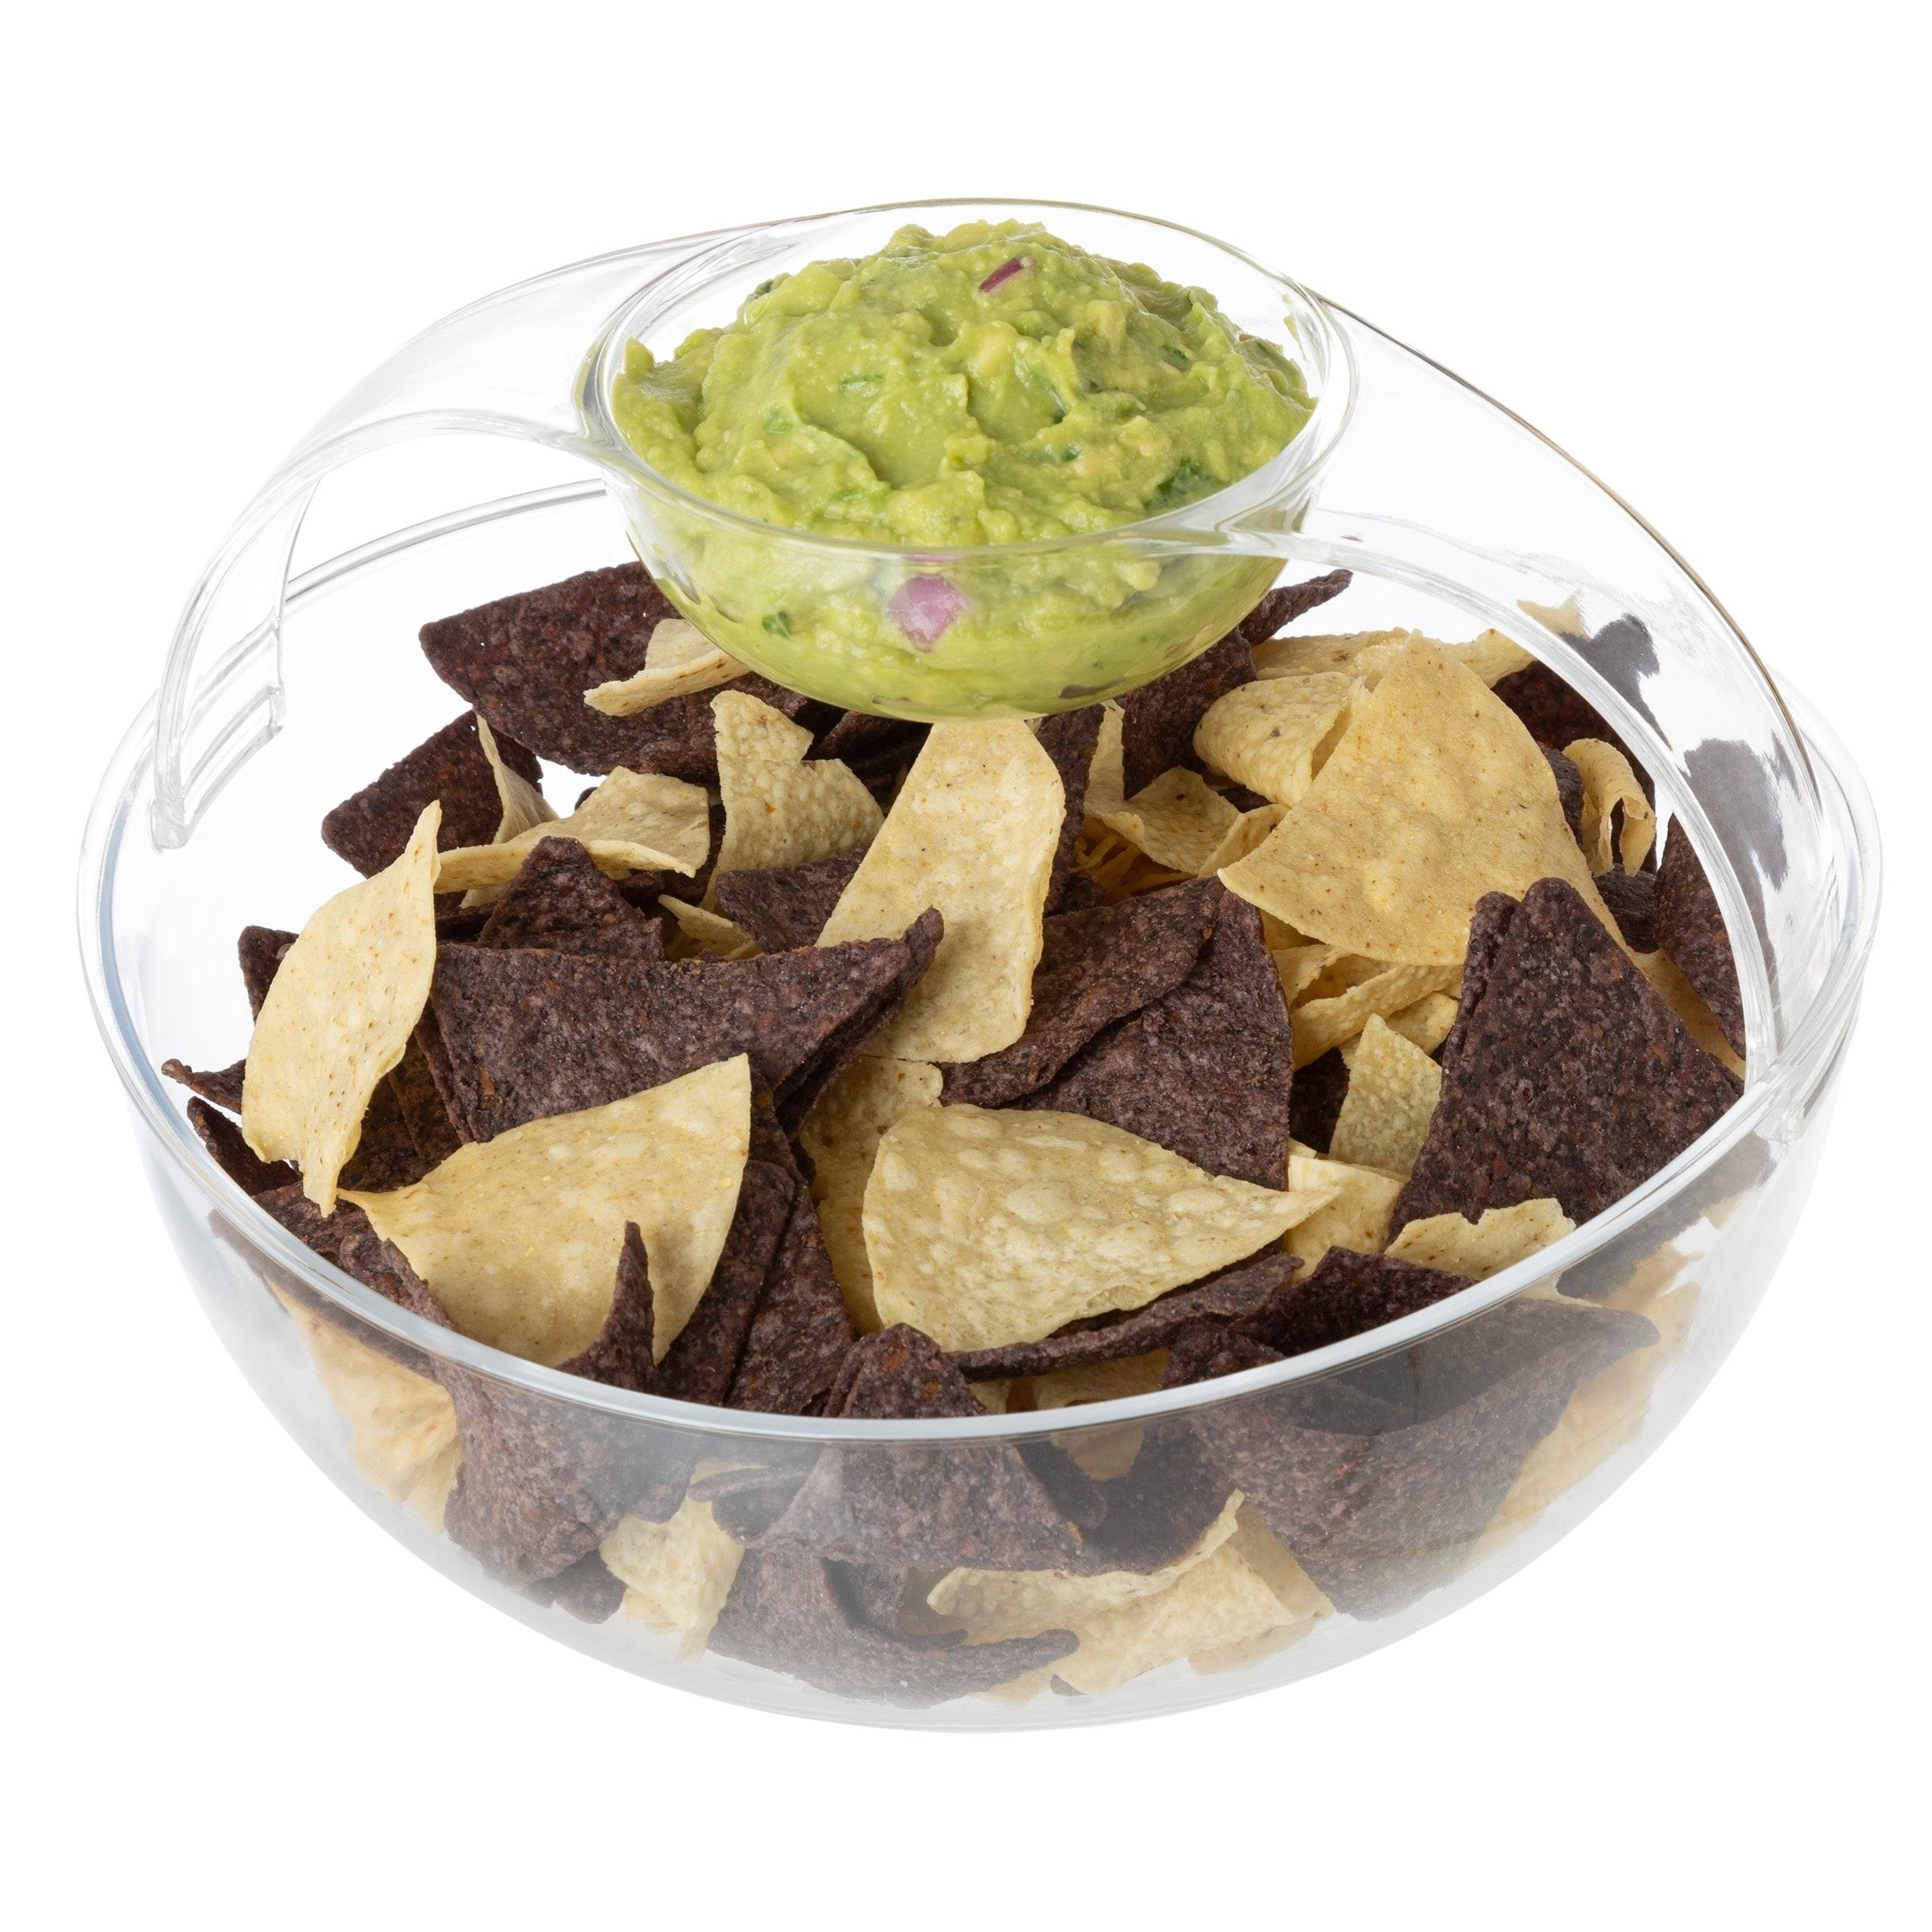 4 PC Plastic Salsa Bowl Set Mexican Chips Guacamole Dips Bowls Serving BPA FREE